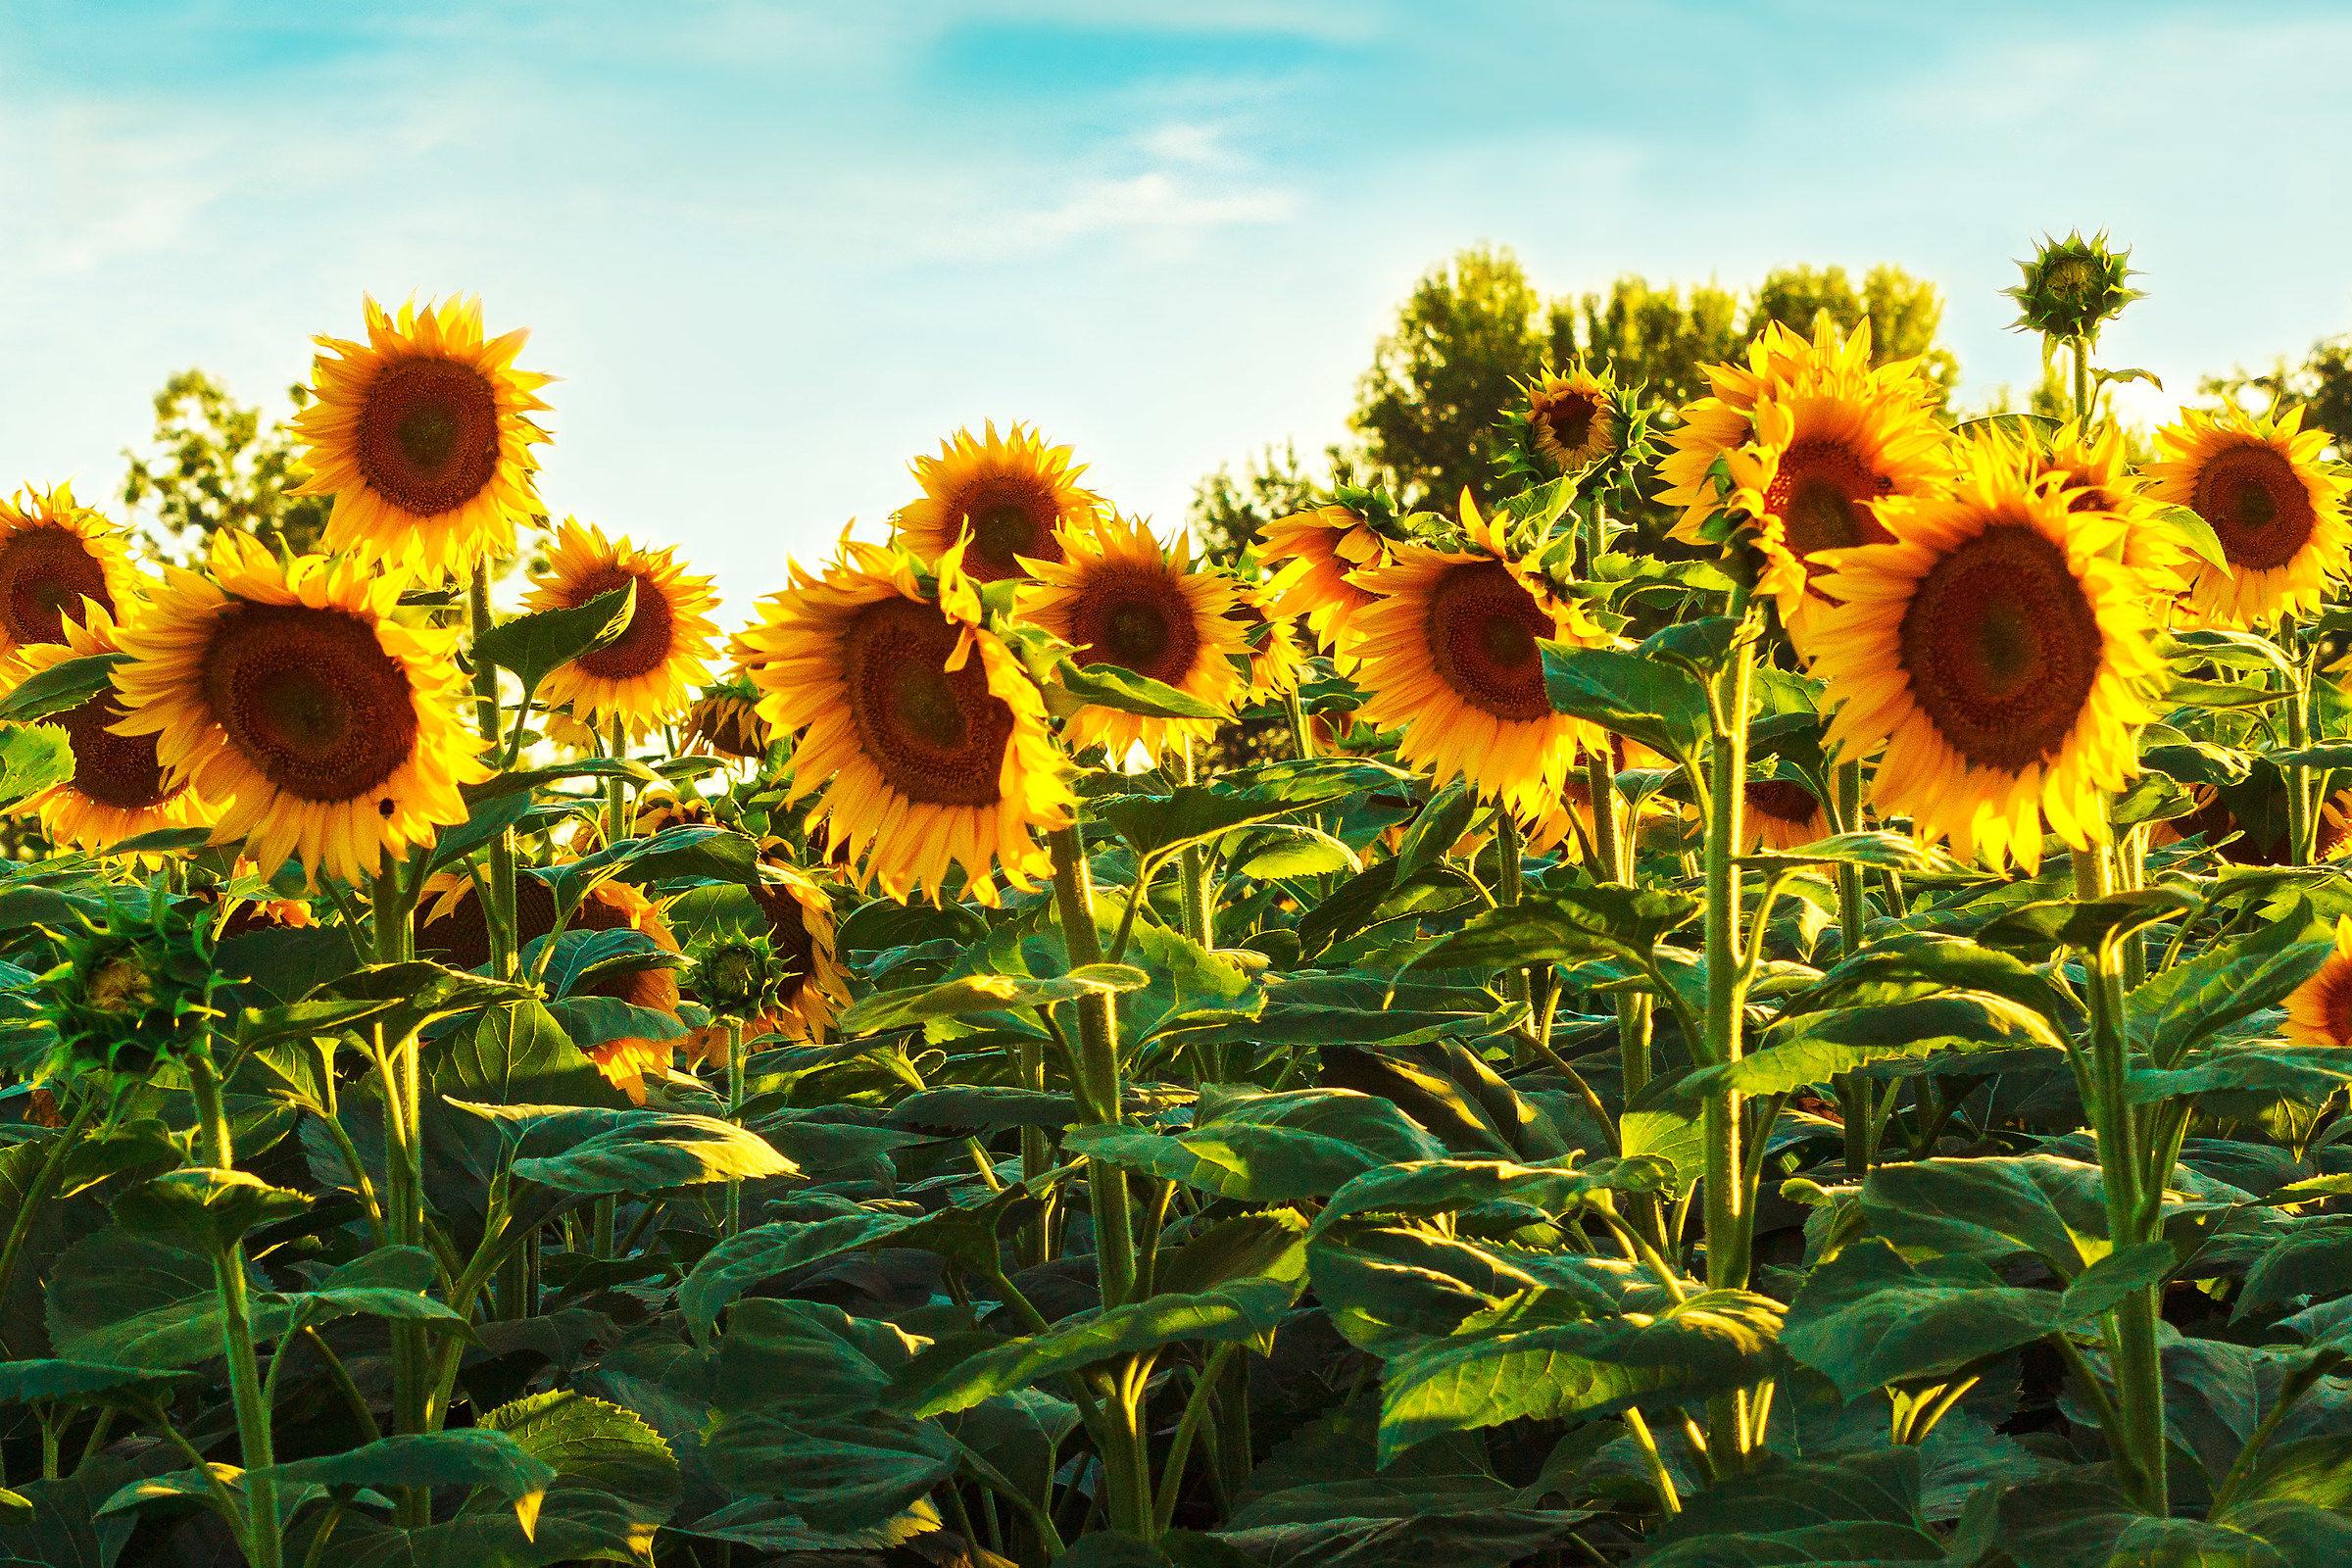 My sunflowers...